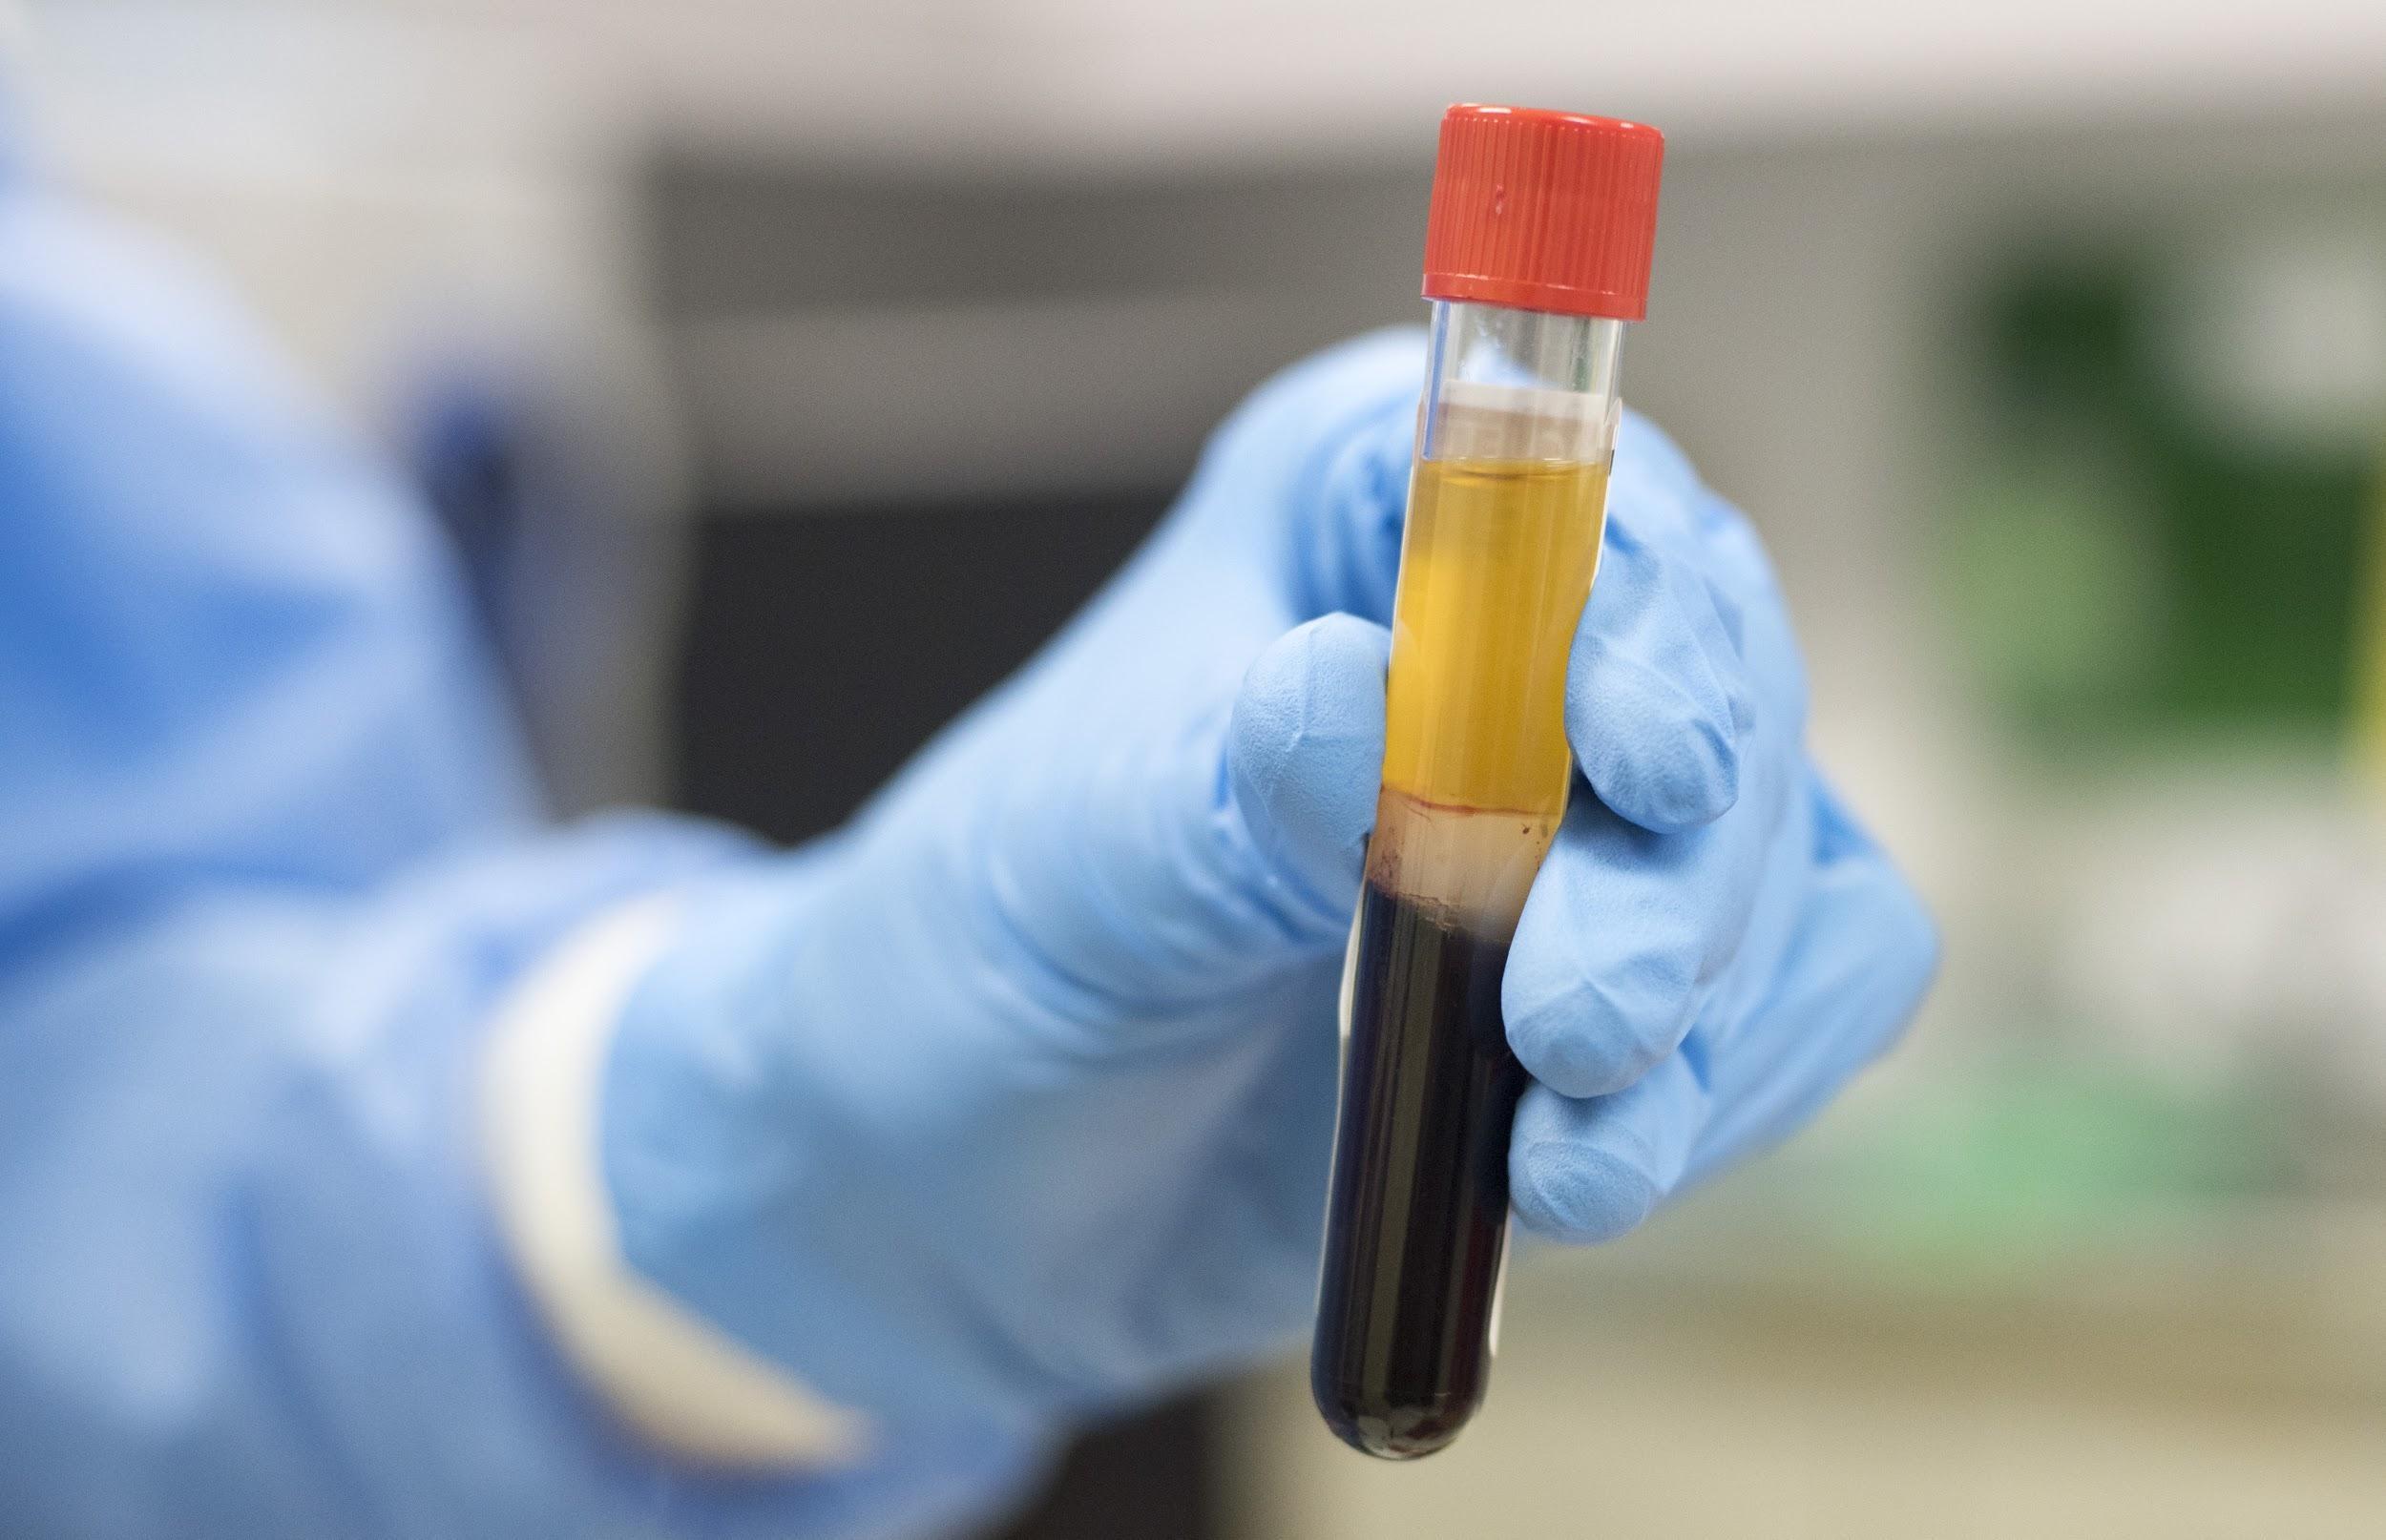 Oxford Covid-19 vaccine trials resumes in PGIMER